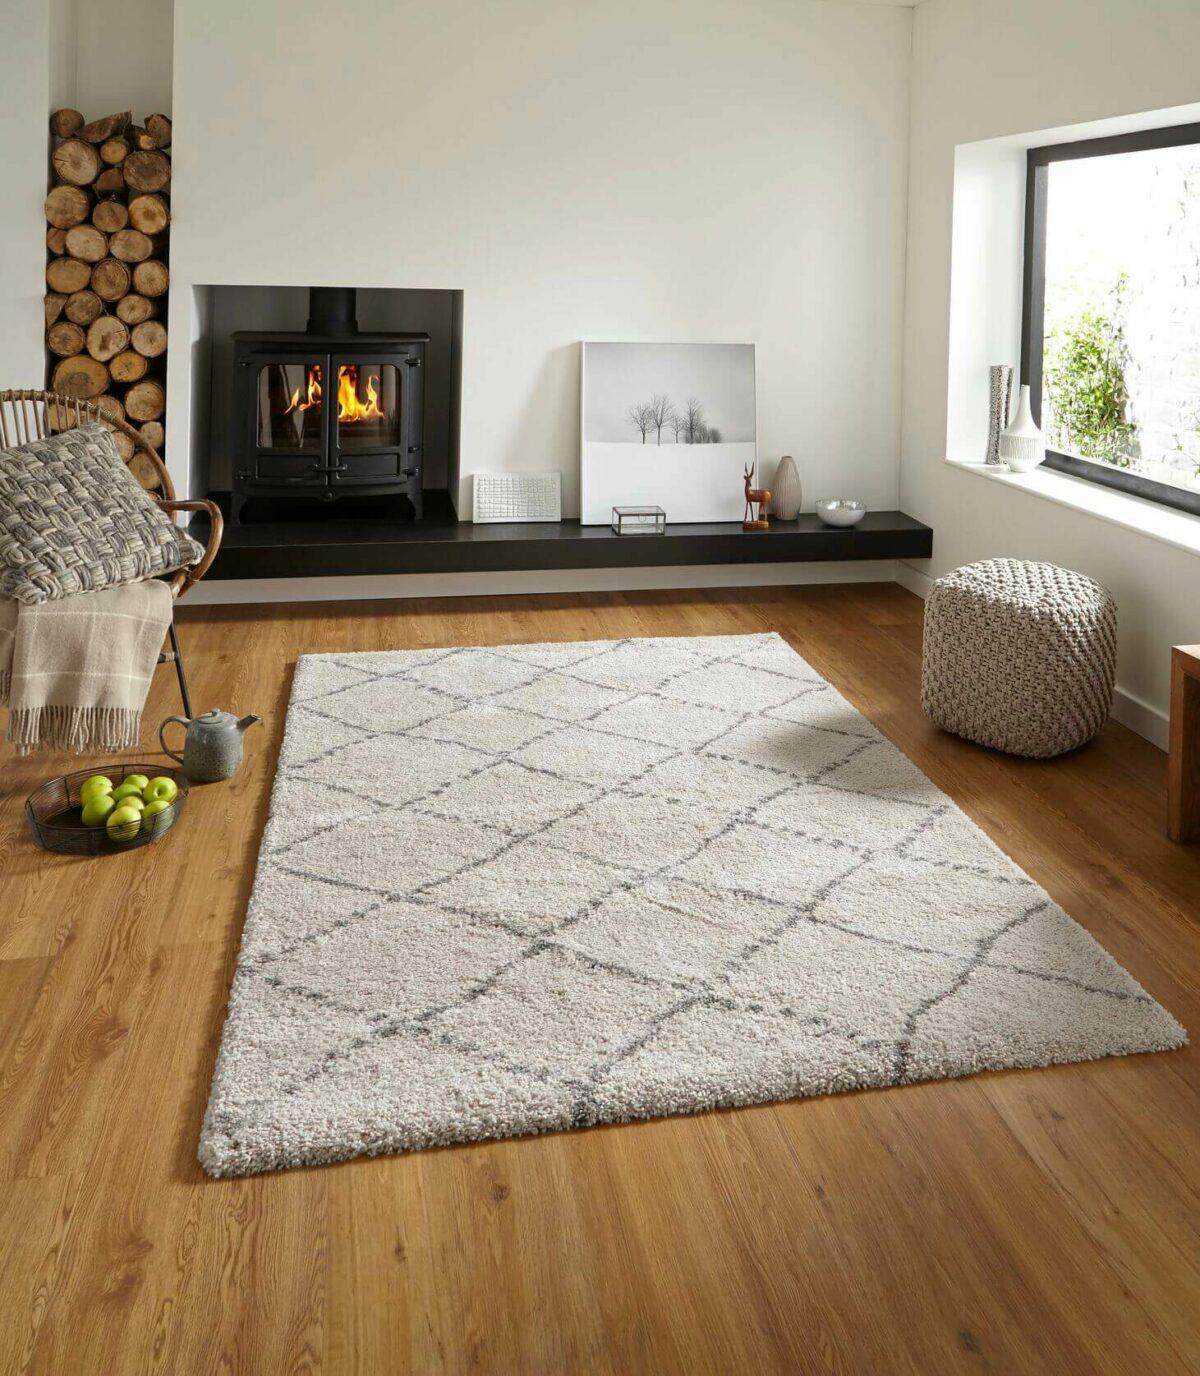 comment choisir tapis salon style hygge cosy shaggy Bobochic